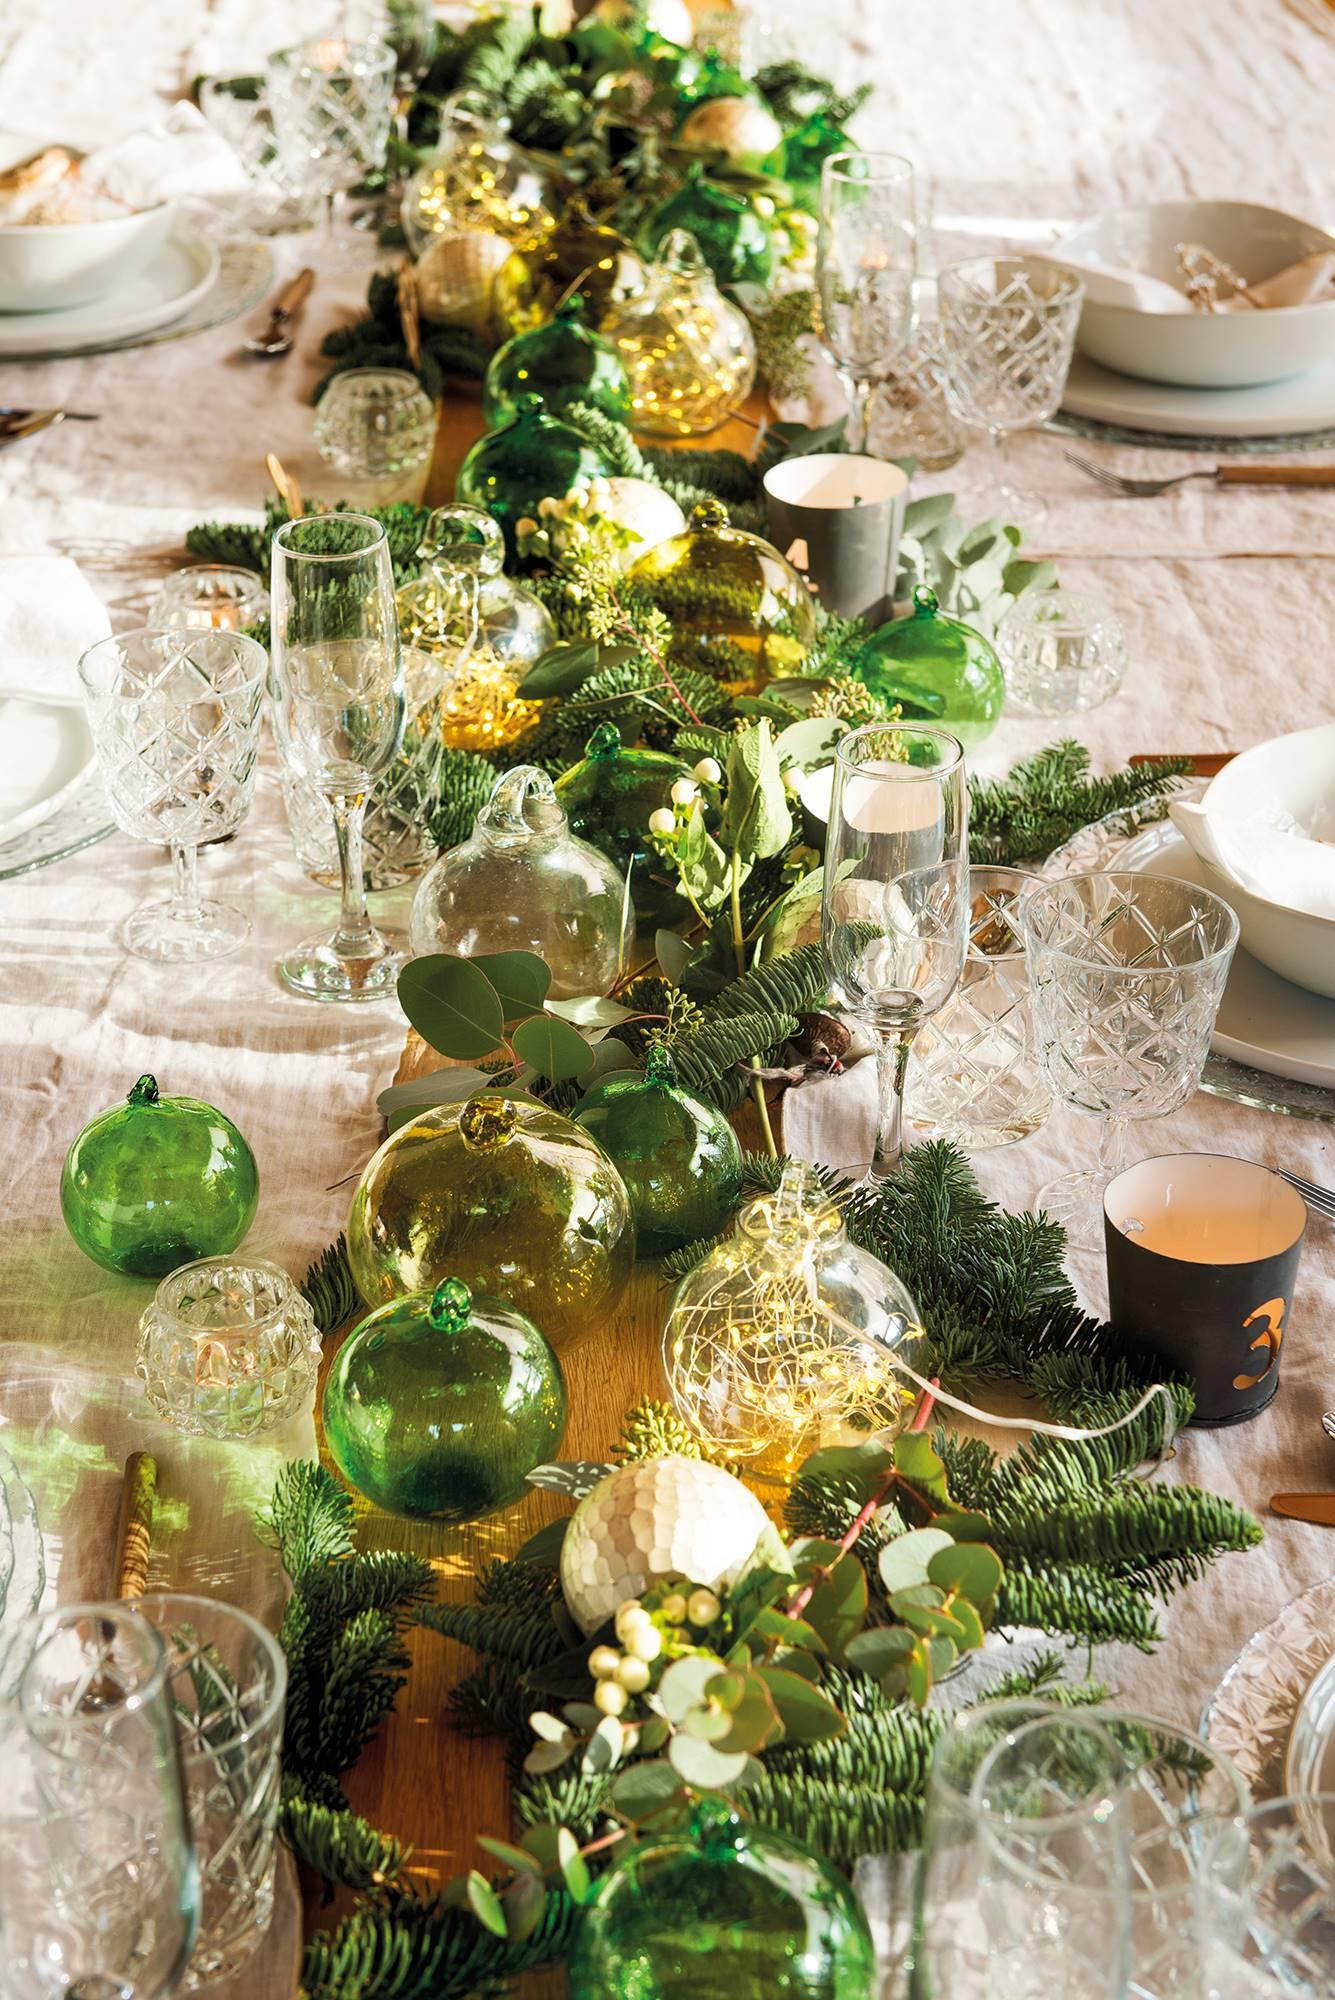 Centros de mesa: ideas para decorar la mesa del comedor